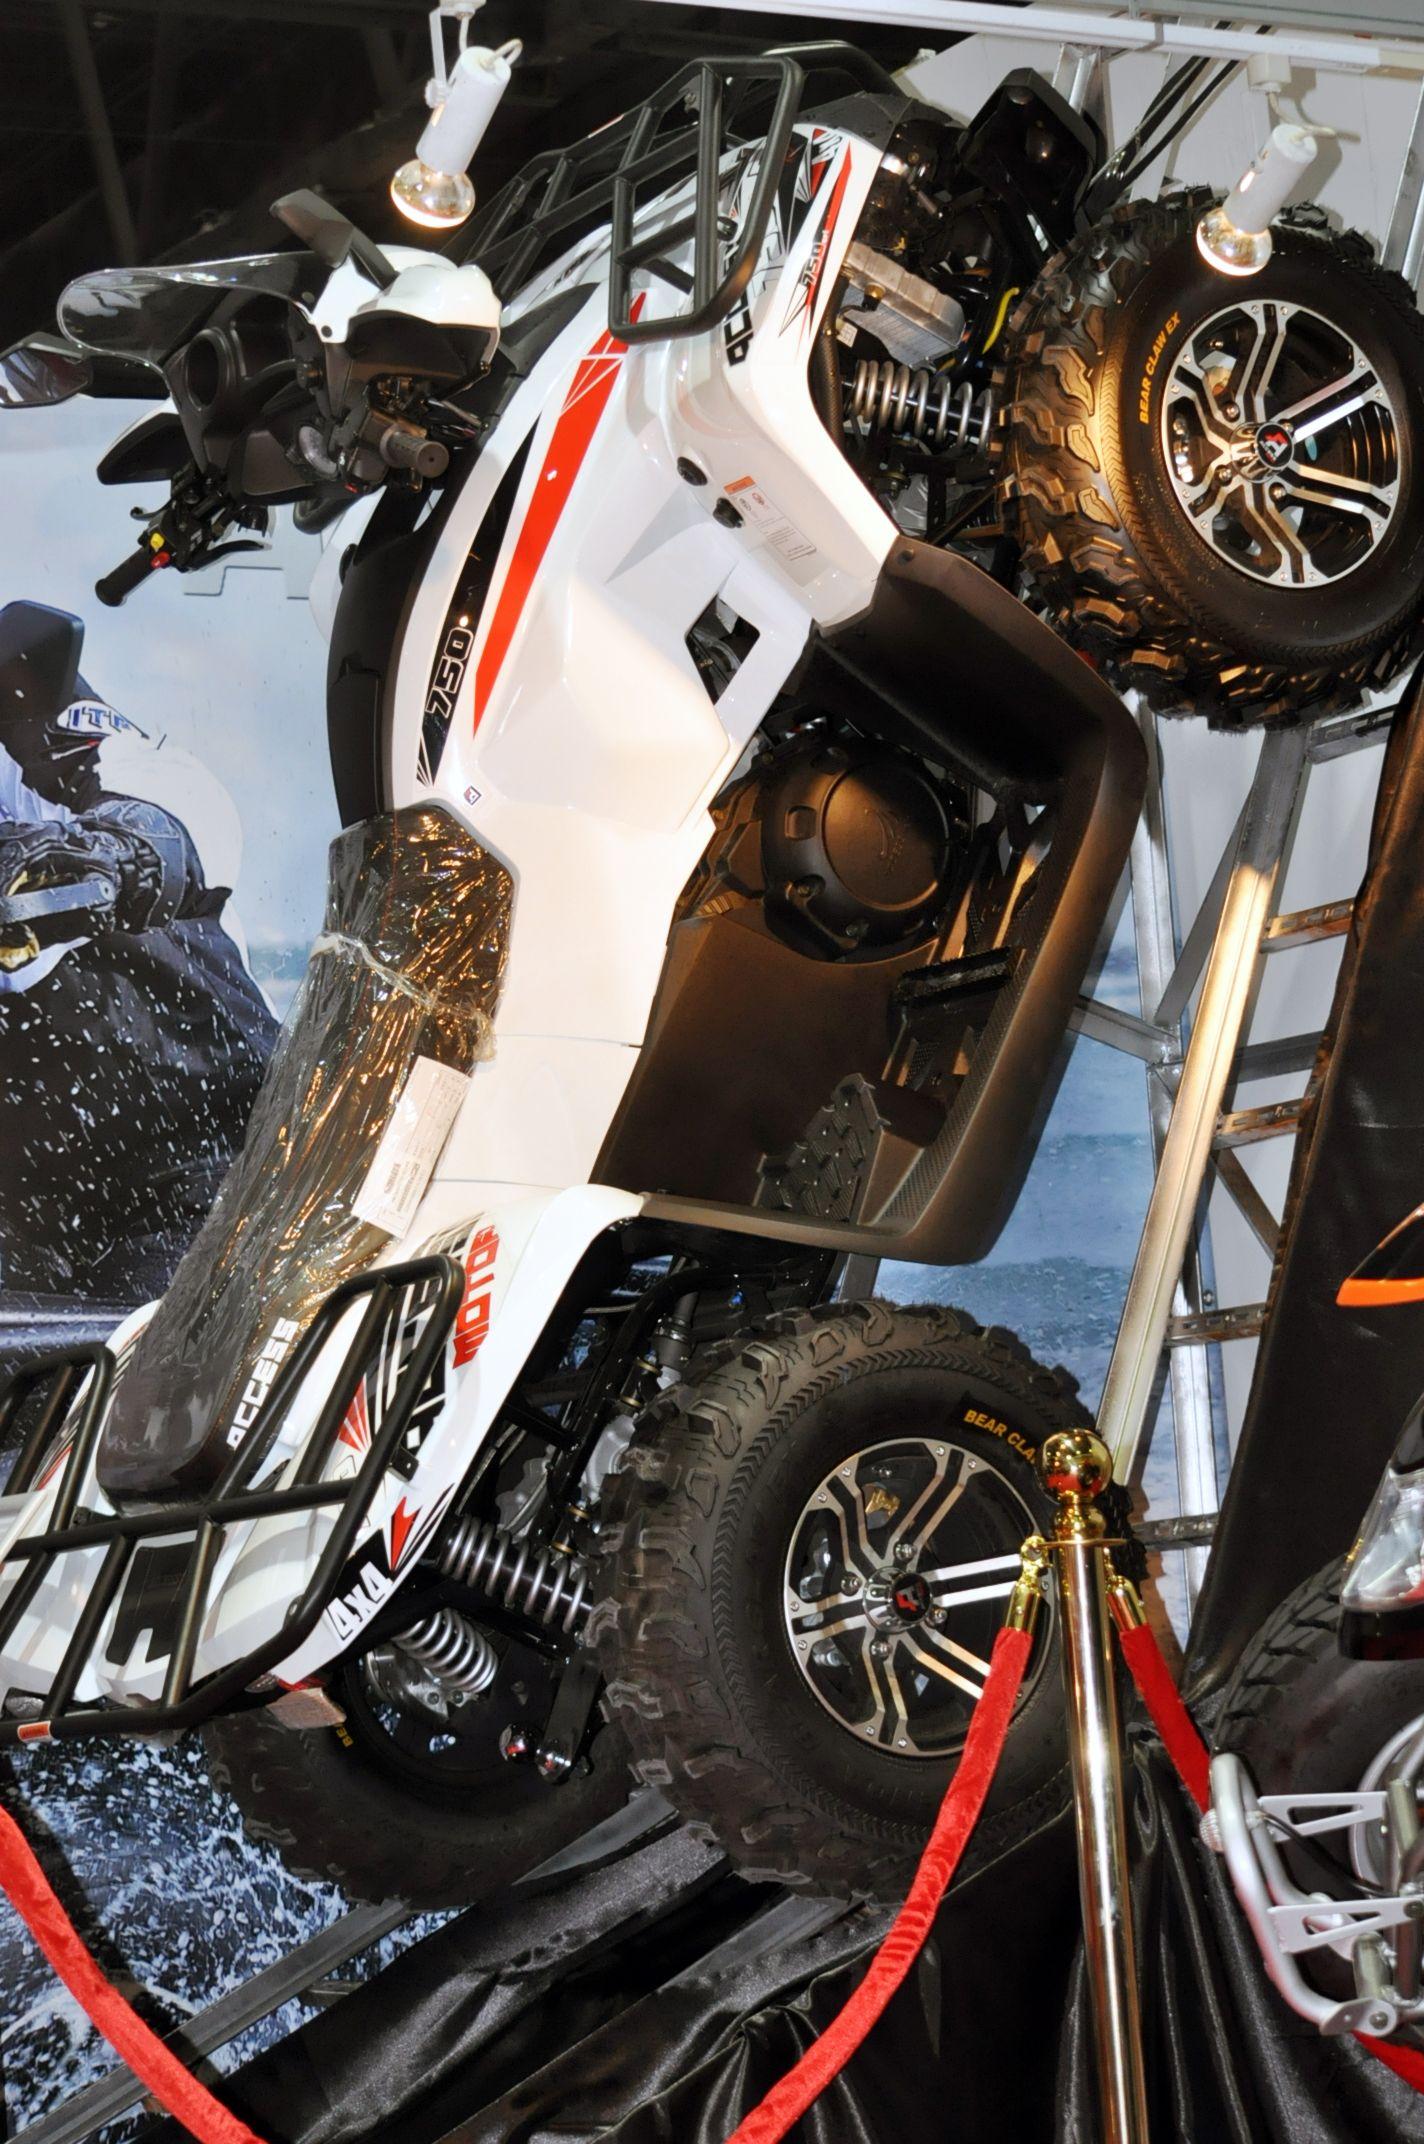 Dirt Bike Center Stand At Dubai International Motor Show 2015